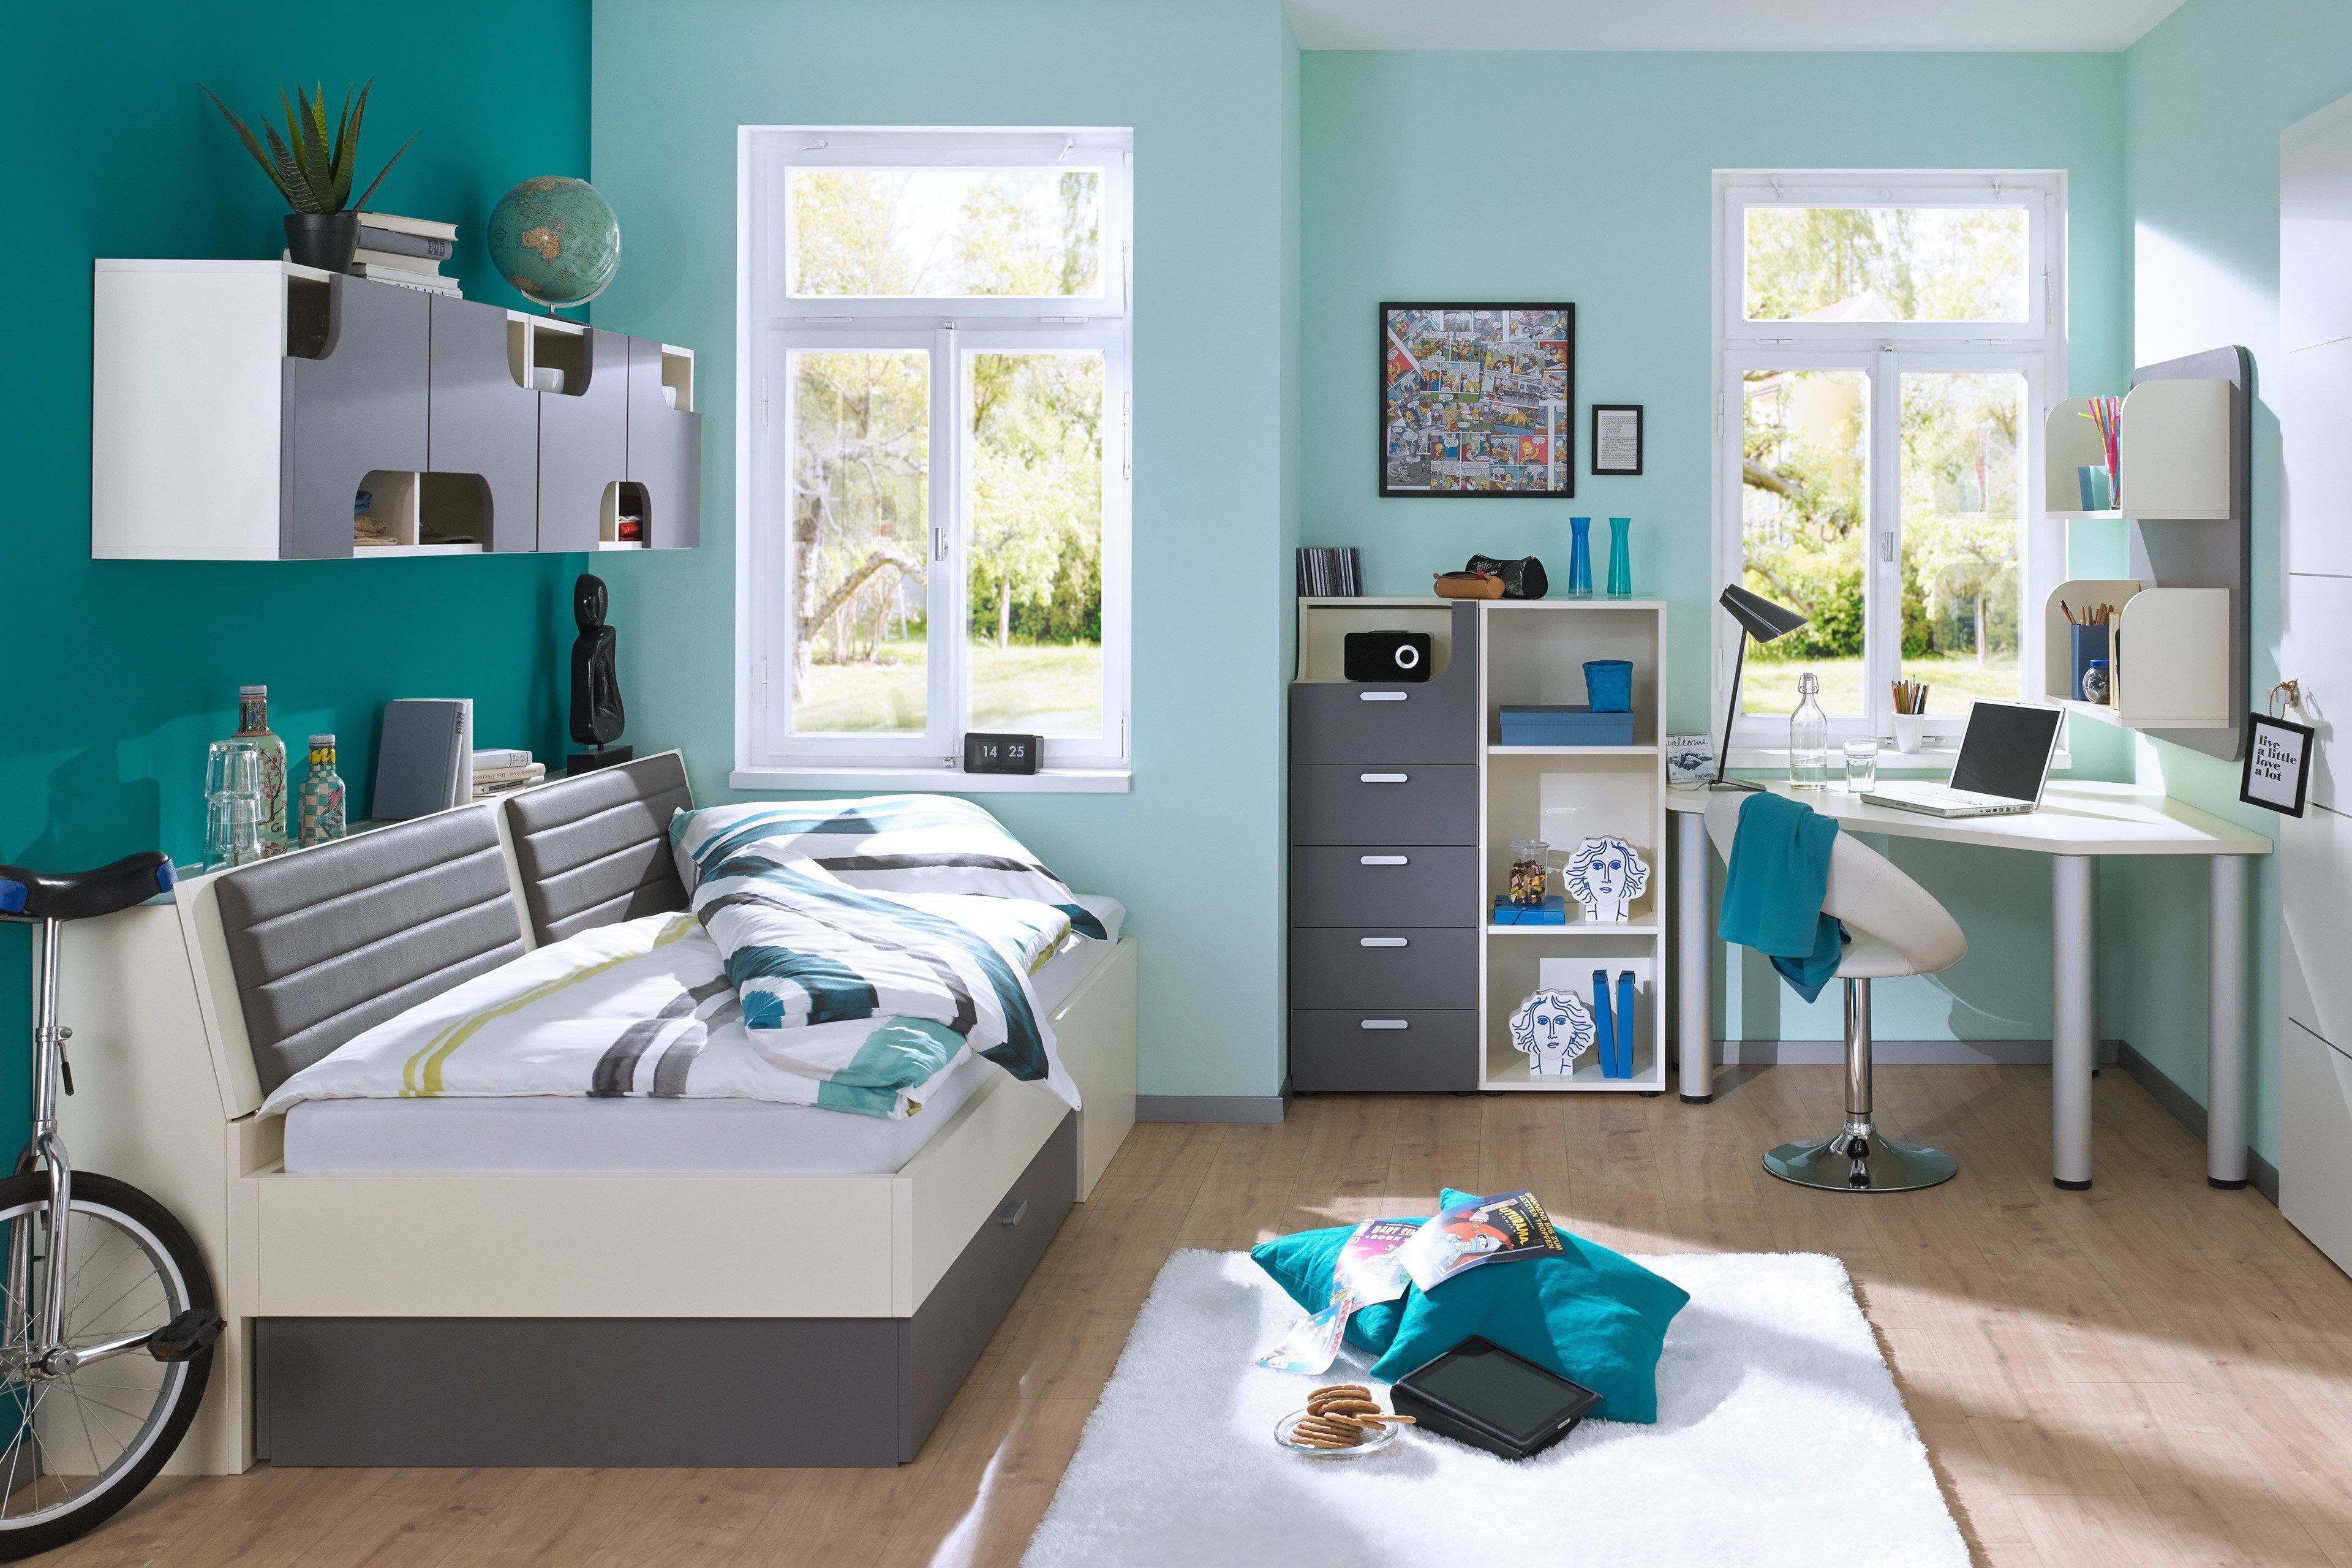 rudolf max i bett cremewei felsgrau m bel letz ihr online shop. Black Bedroom Furniture Sets. Home Design Ideas